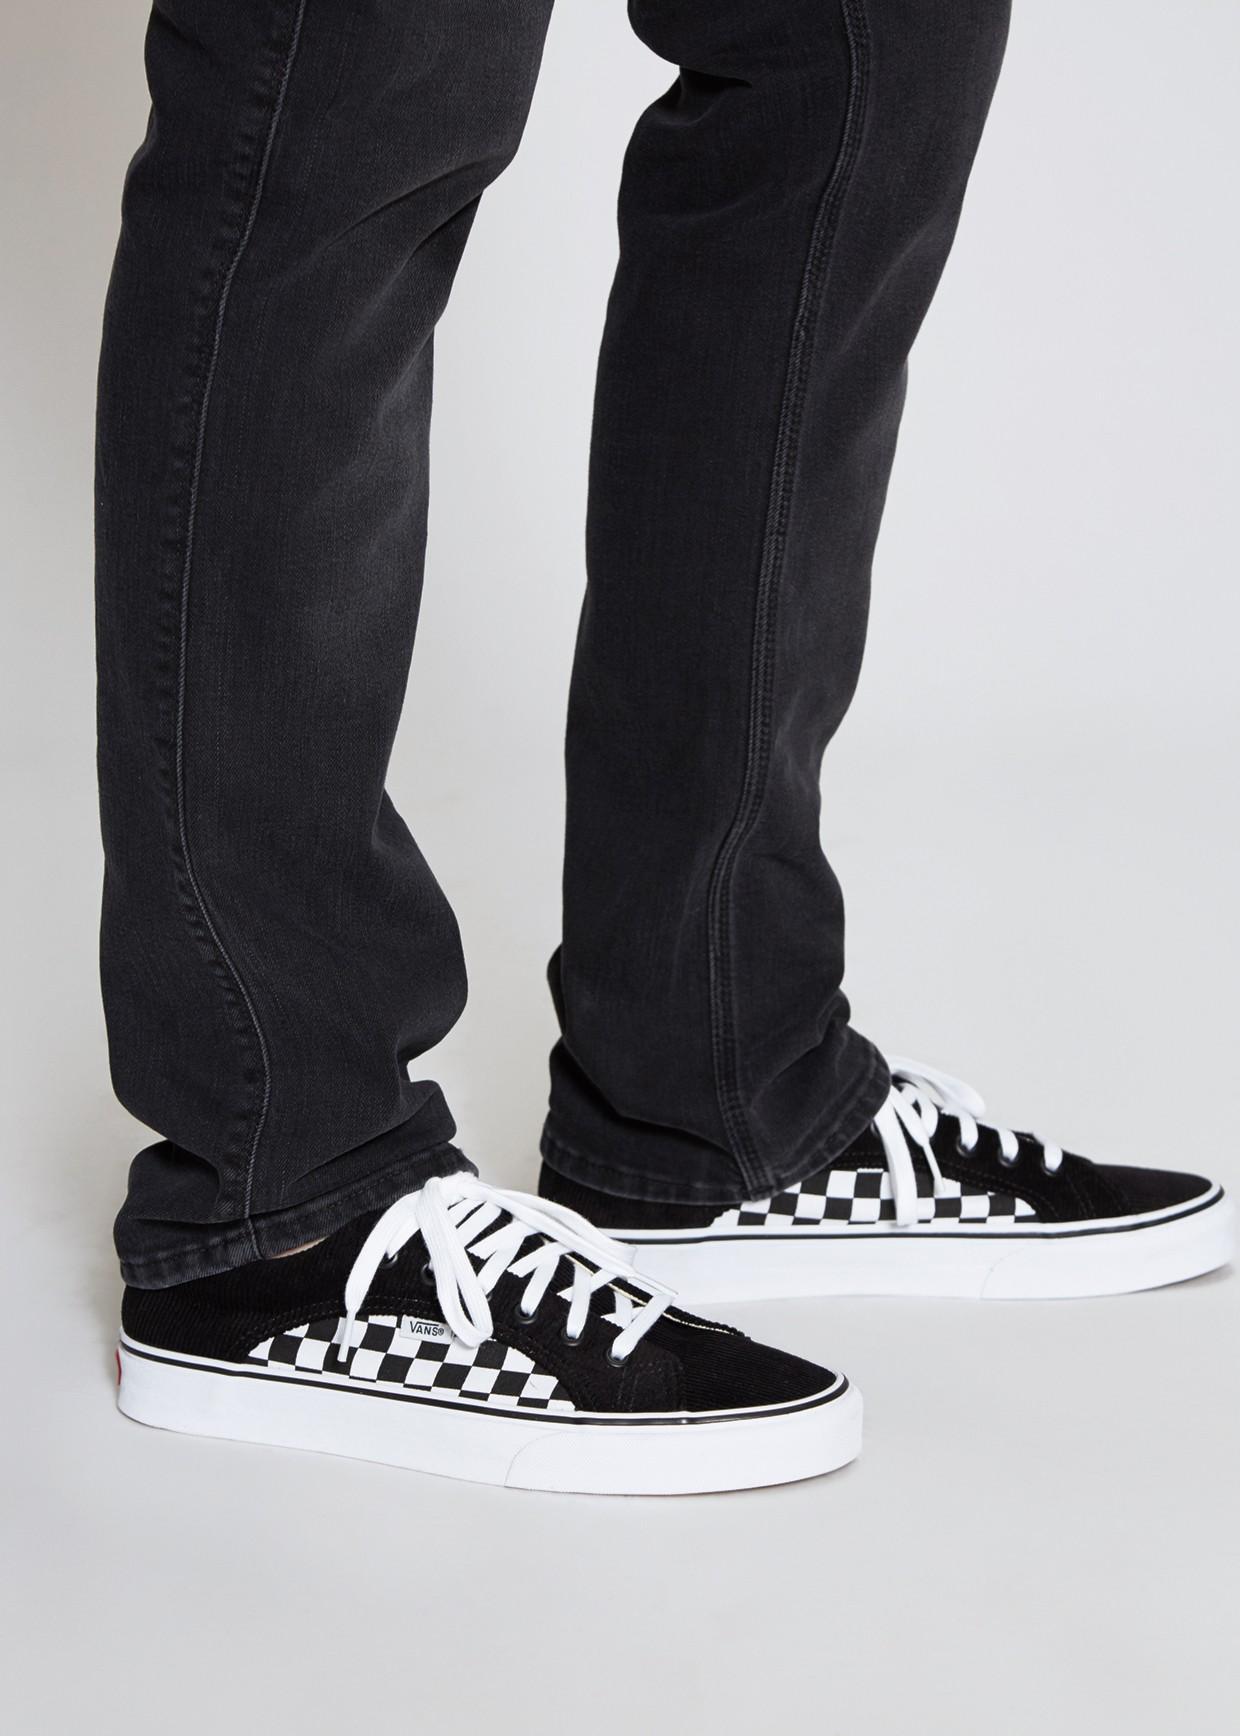 e5f29795a1baa0 Vans Checker   Cord Lampin Sneaker for Men - Lyst